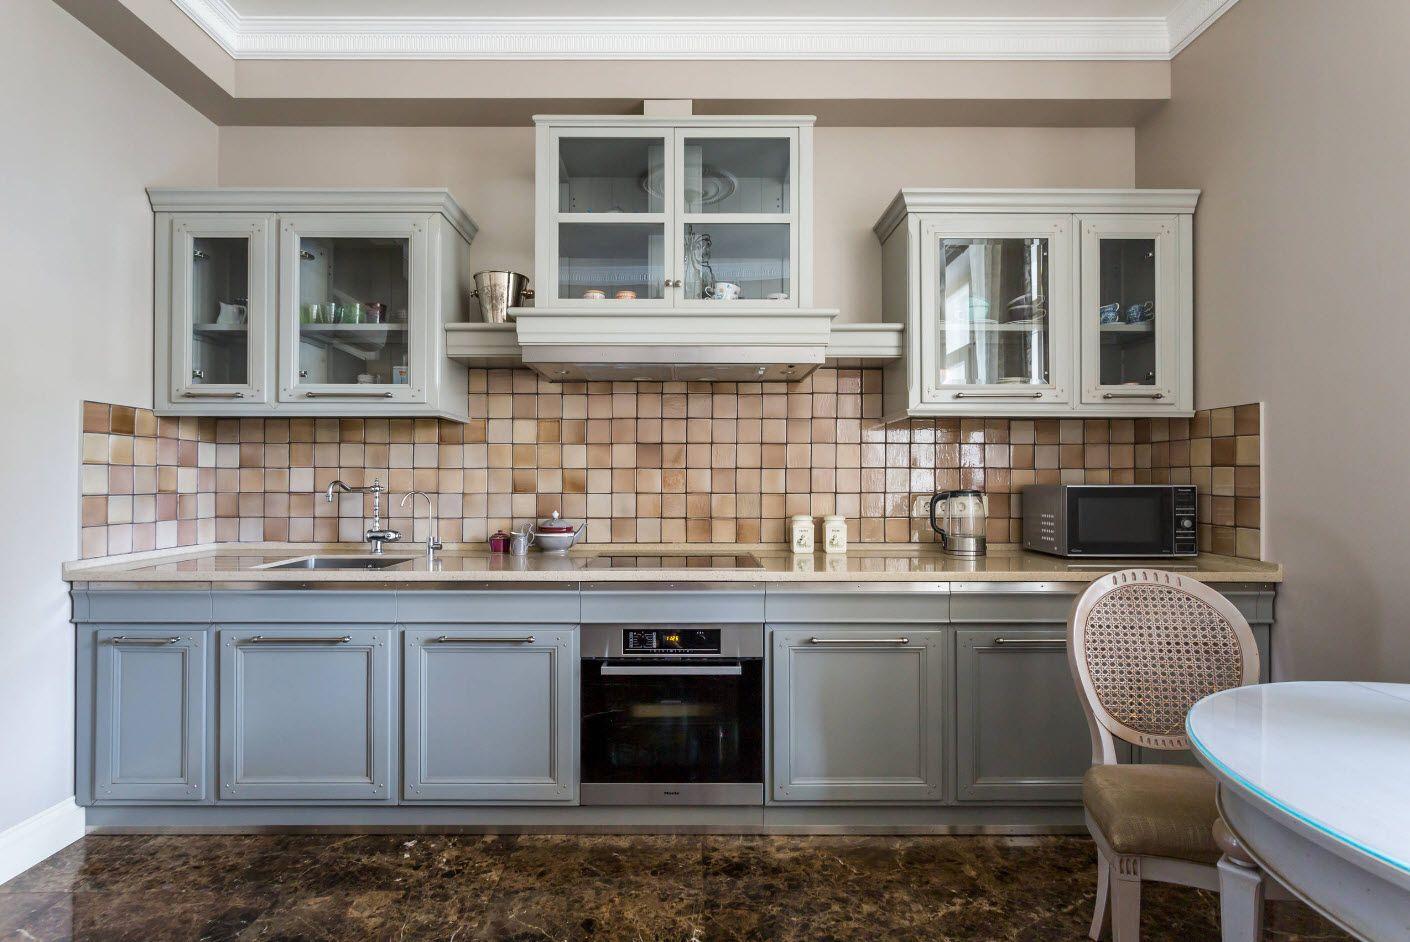 Practical tiled splashback in rustic styled Ikea kitchen